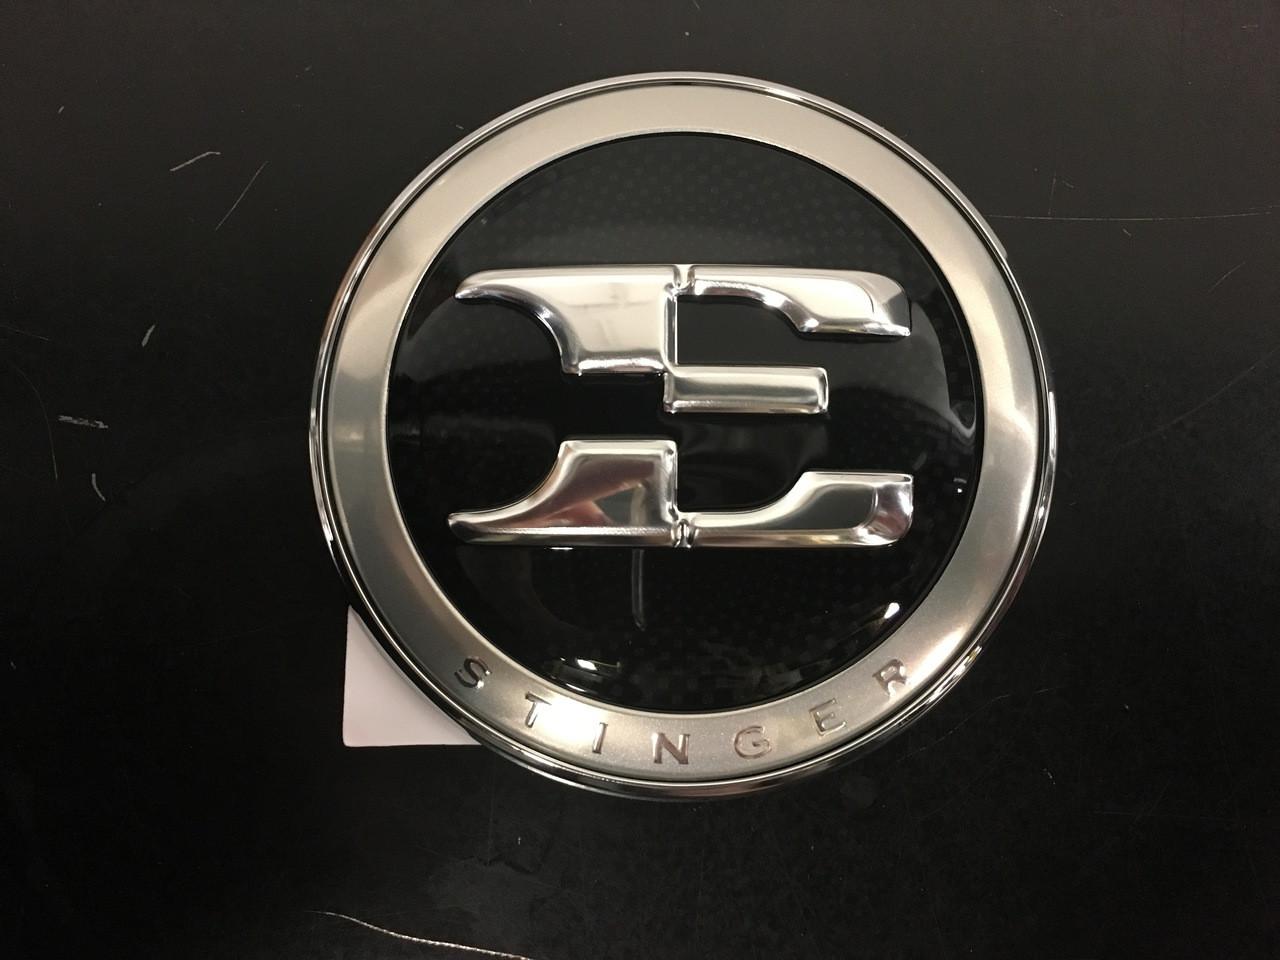 Kia Stinger Emblem Kit - Hood Emblem